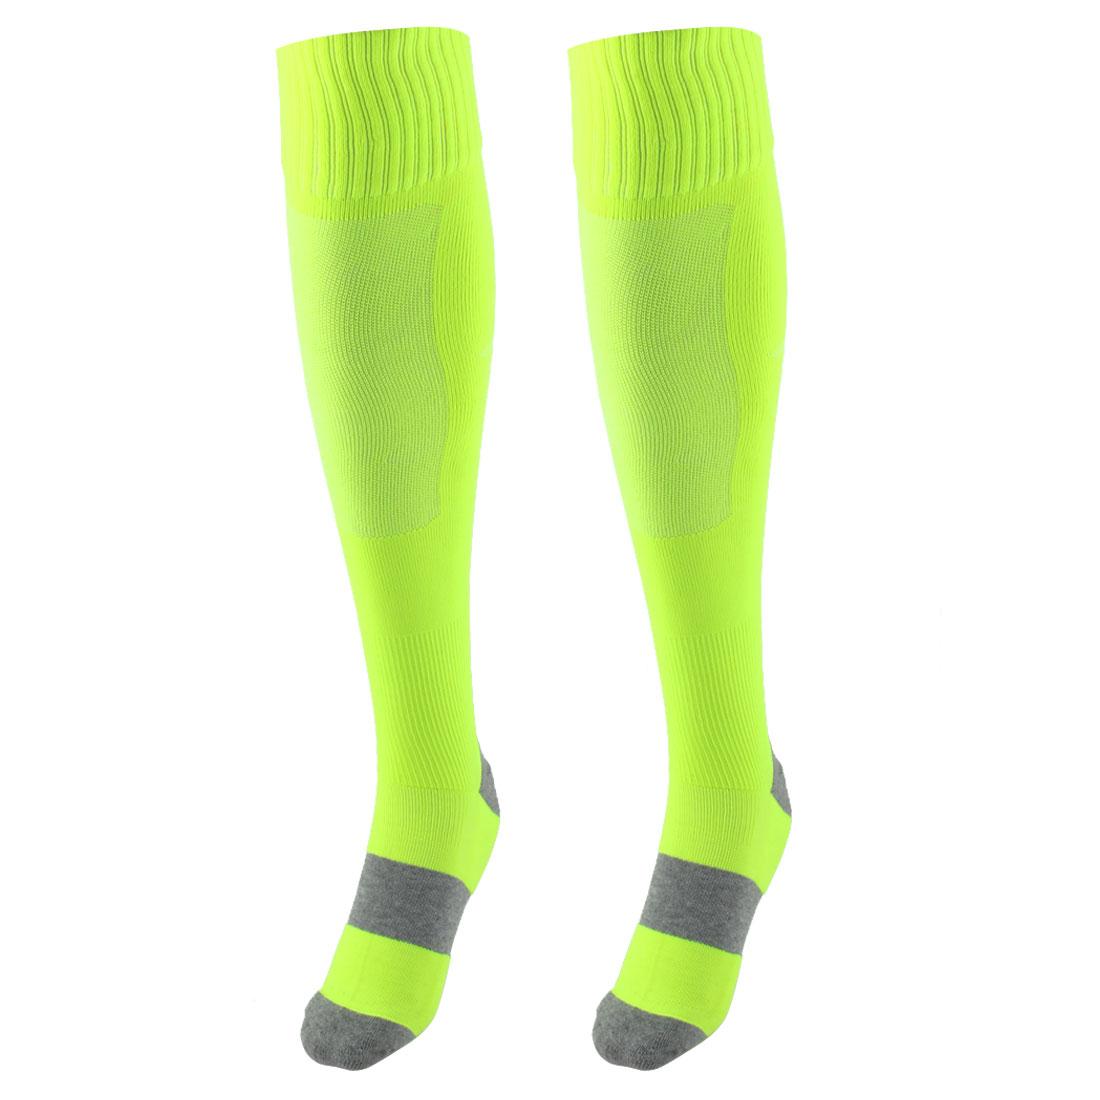 Green Rugby Socks: Unisex Non Slip Stretch Rugby Soccer Football Socks